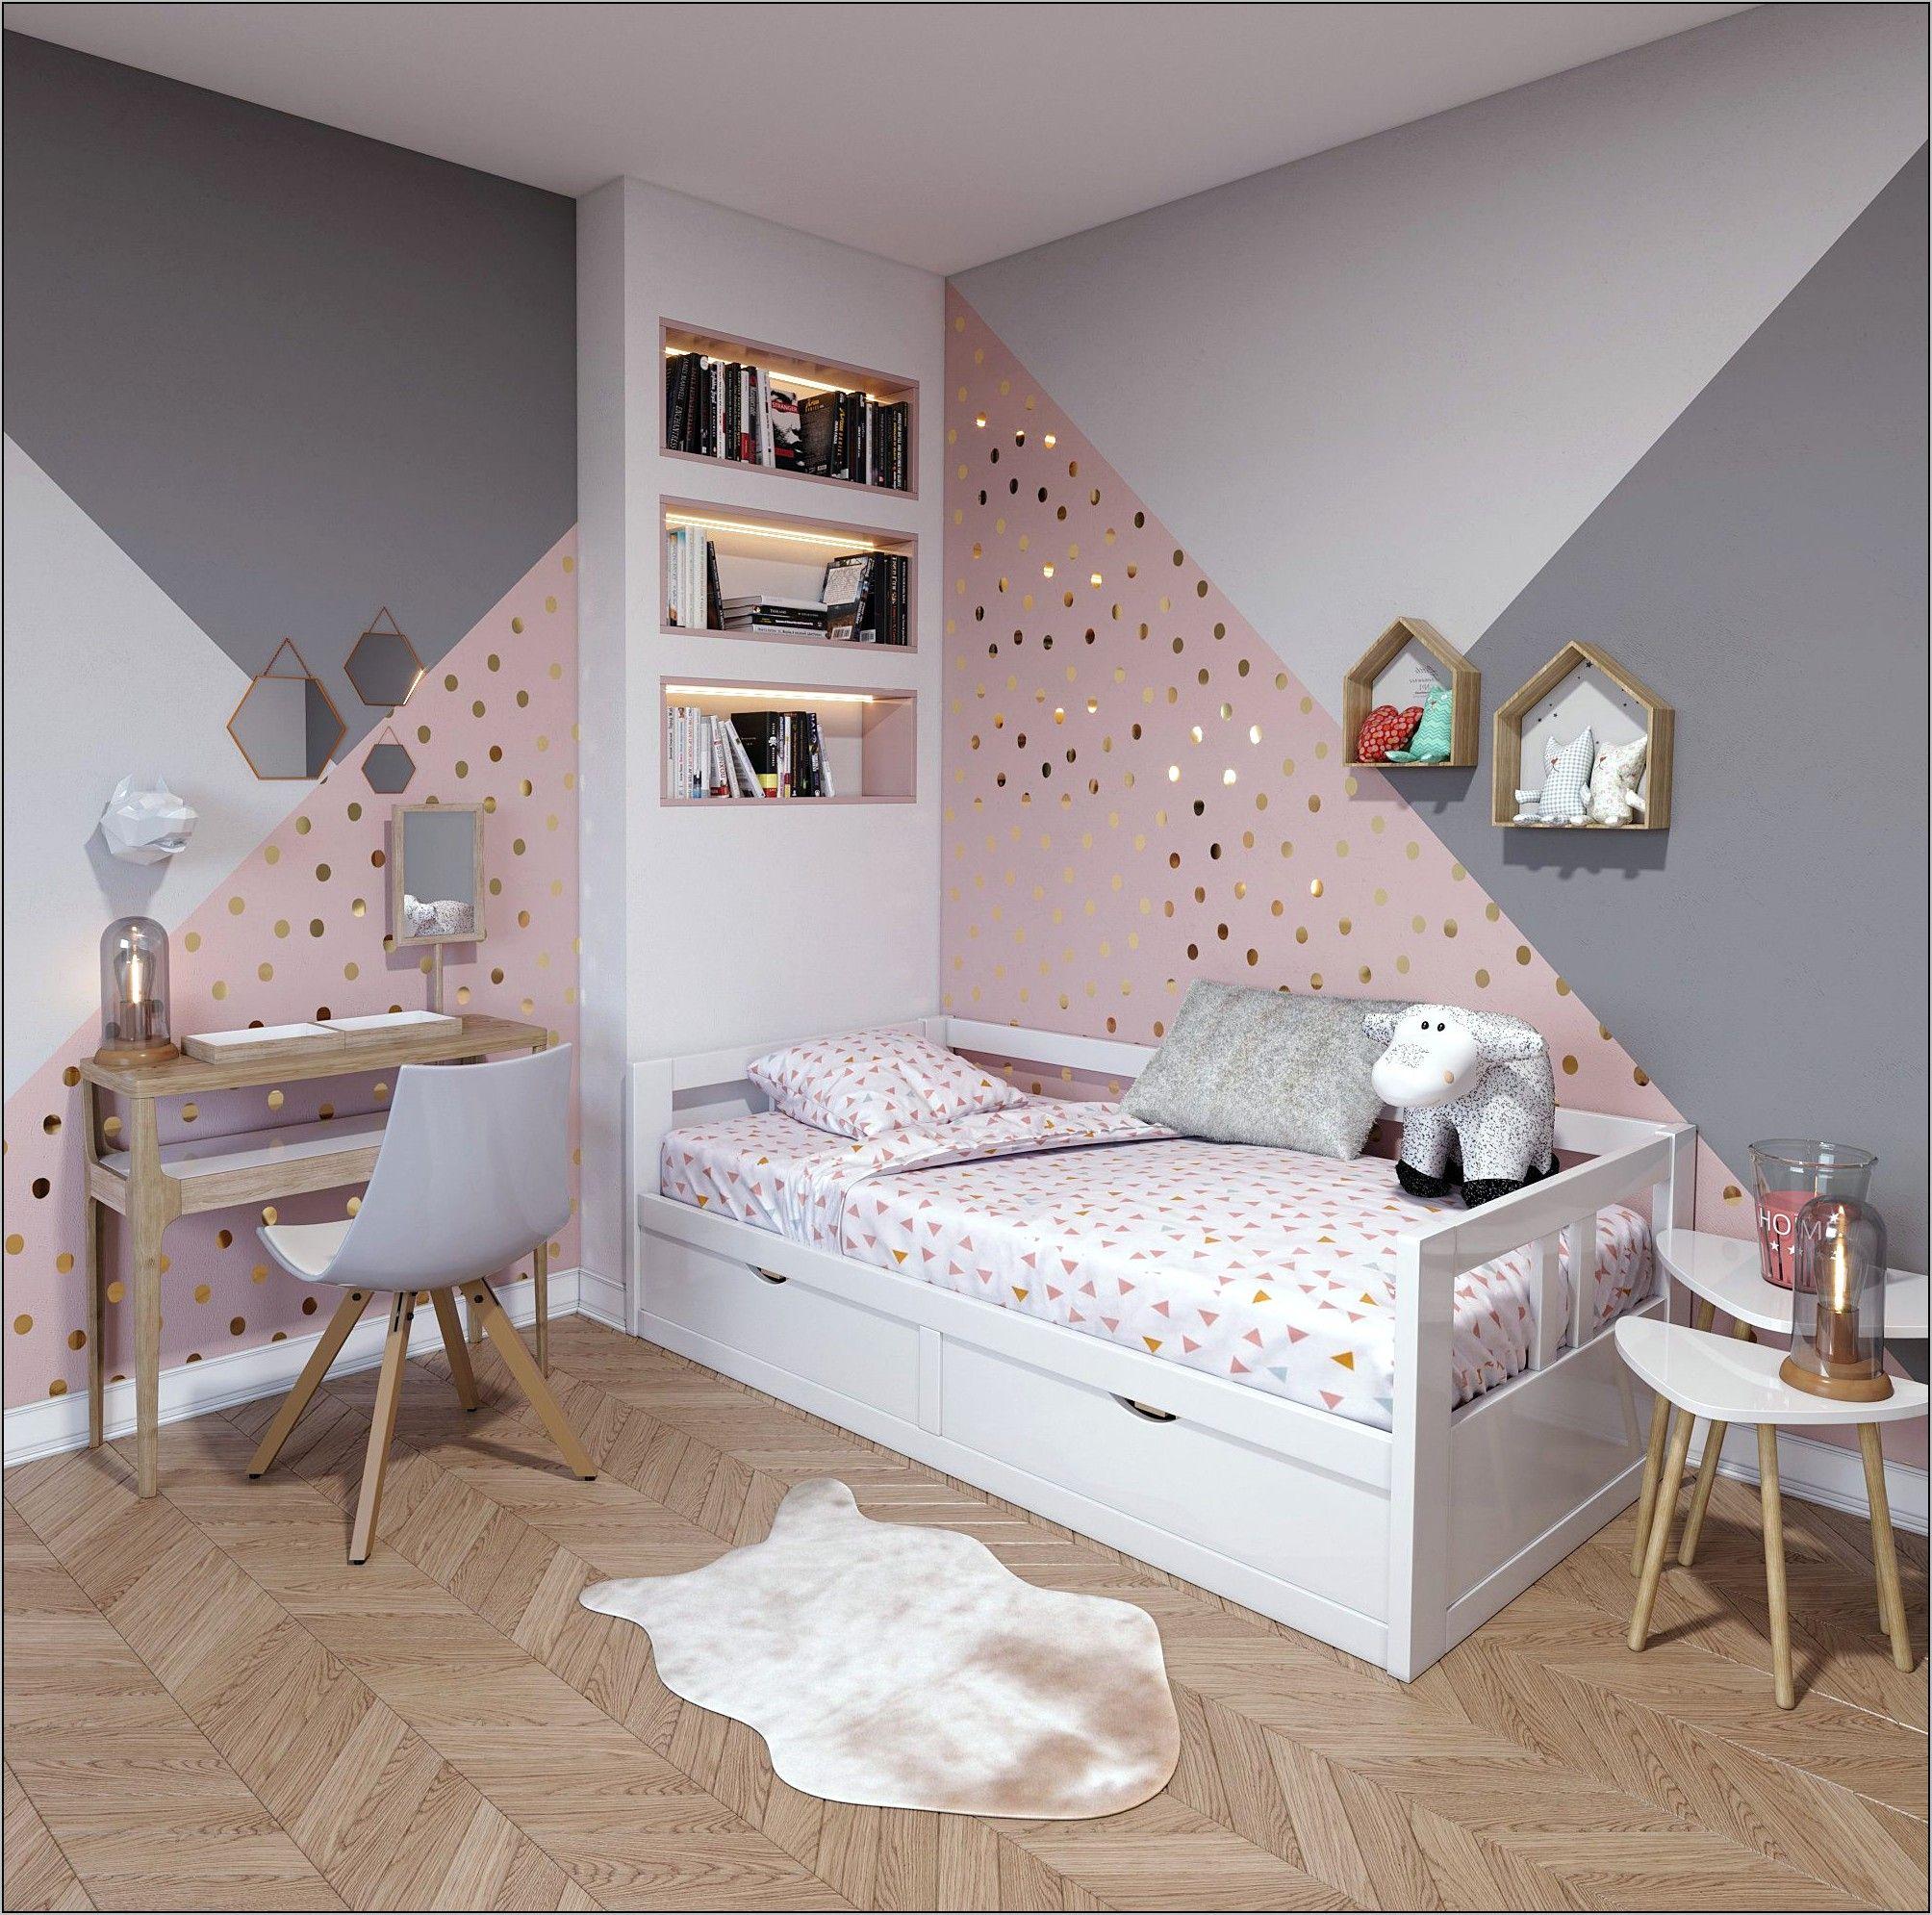 Gris Chambre Ado Fille deco chambre ado garcon gris cinema en 2020 | chambre enfant